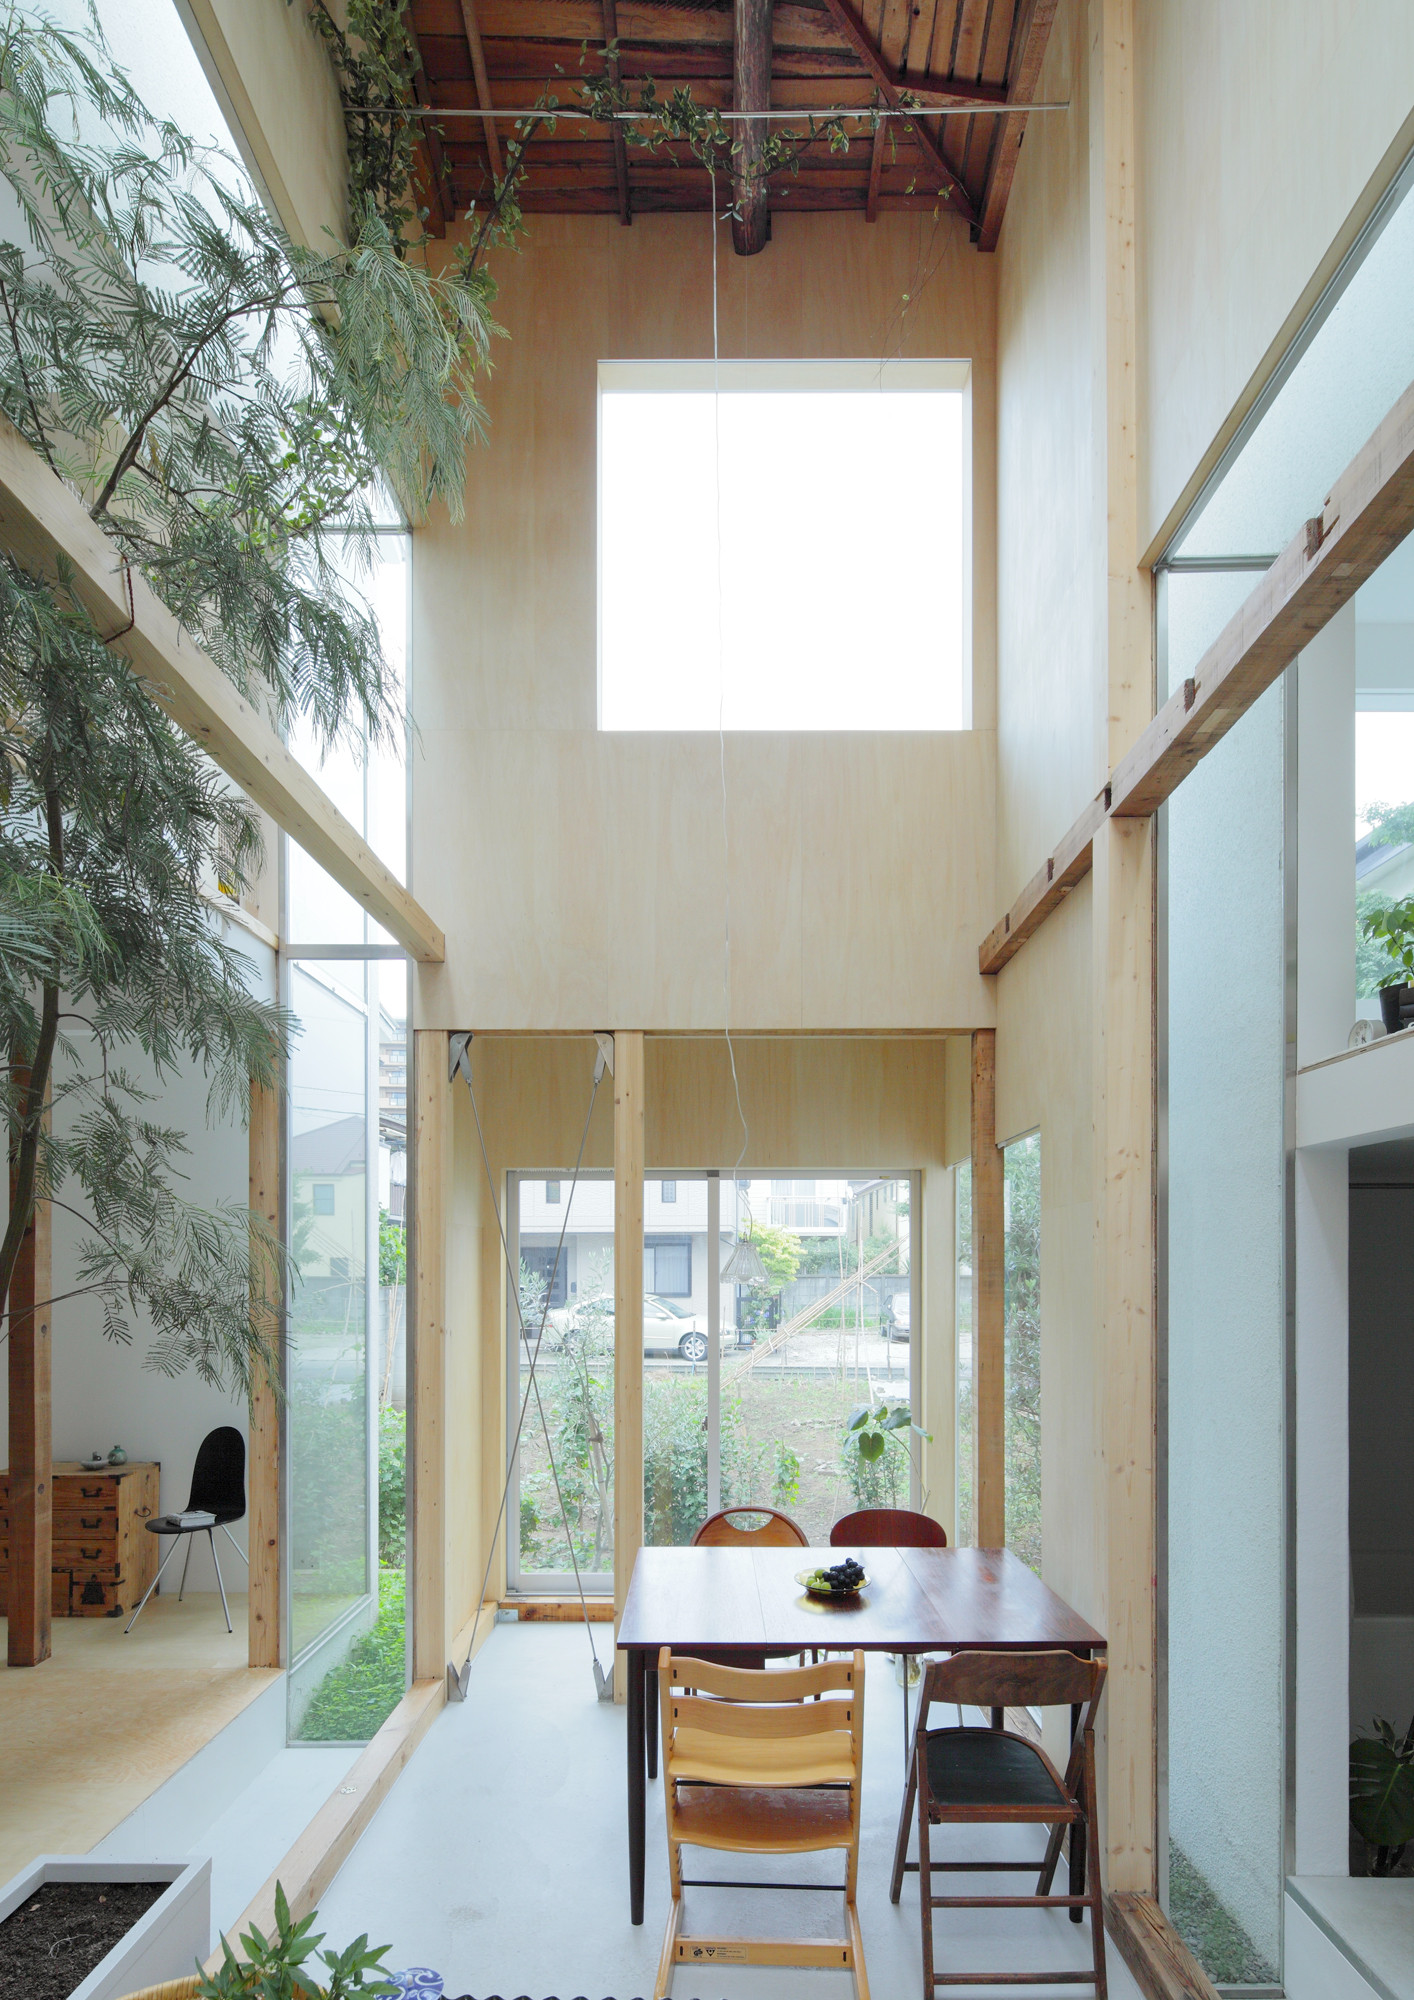 House komazawa park mico archdaily for Japanese minimalist house interior